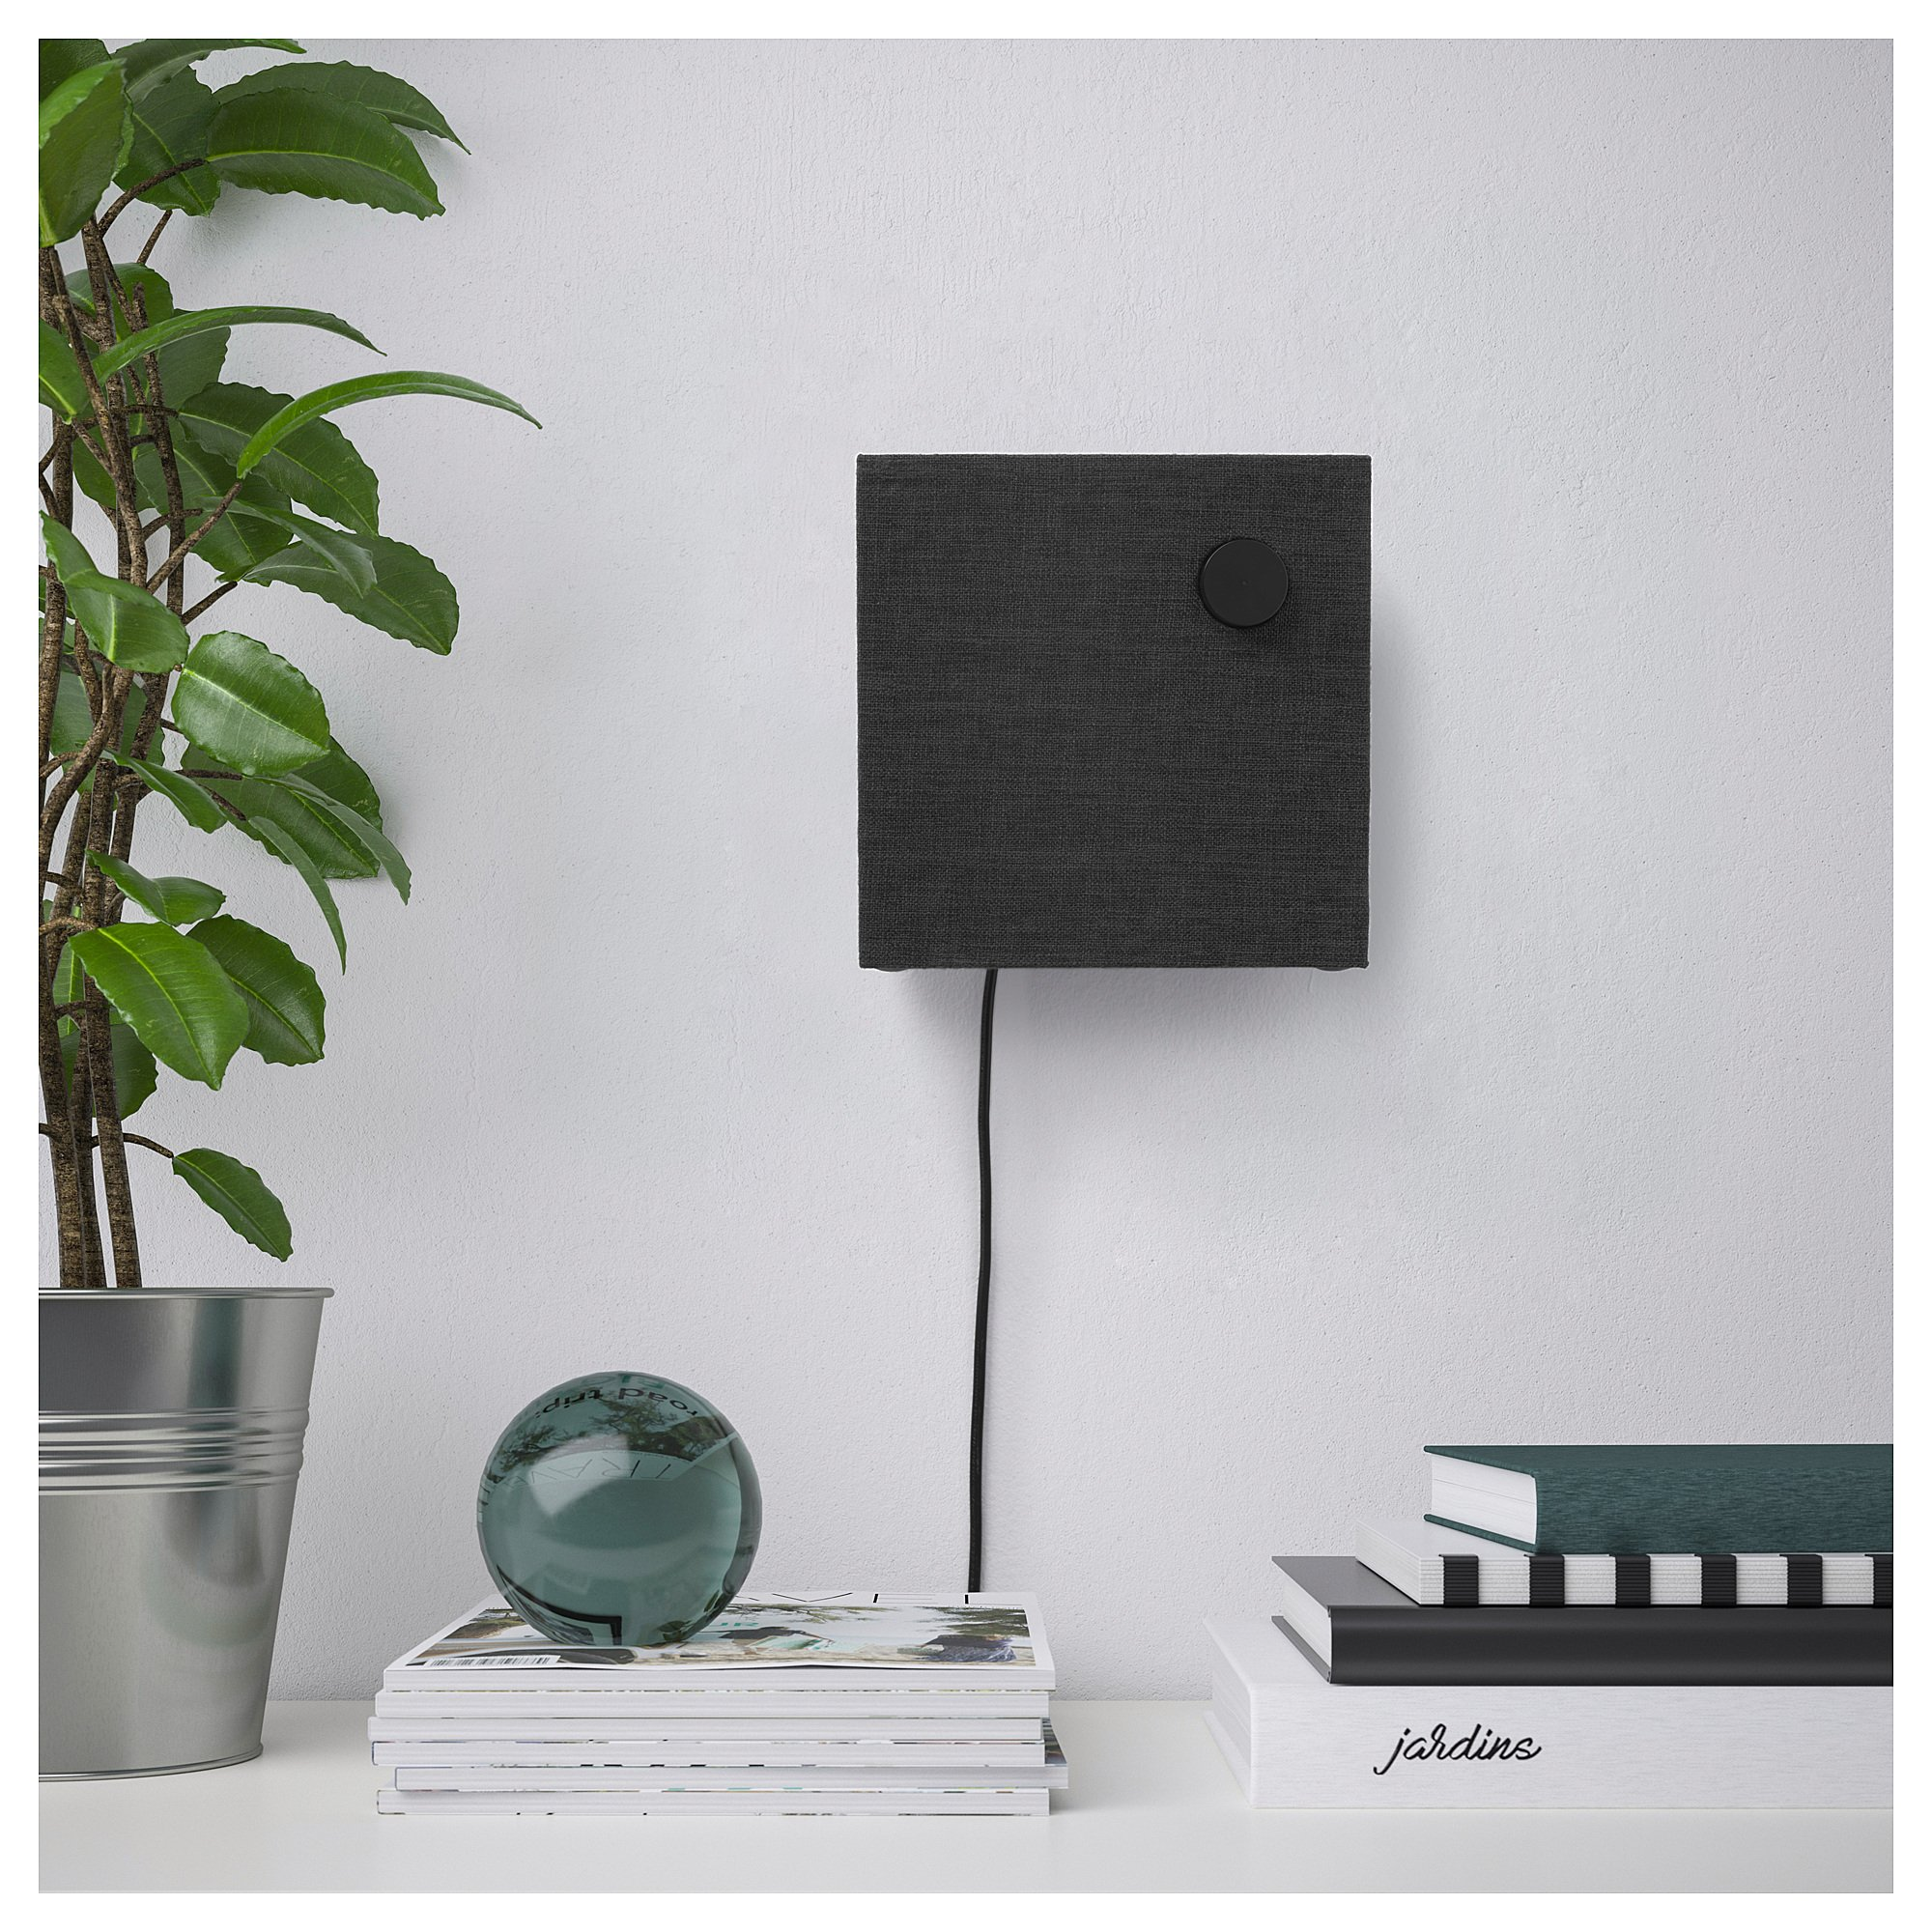 ikea eneby bluetooth lautsprecher aus dem m belhaus. Black Bedroom Furniture Sets. Home Design Ideas